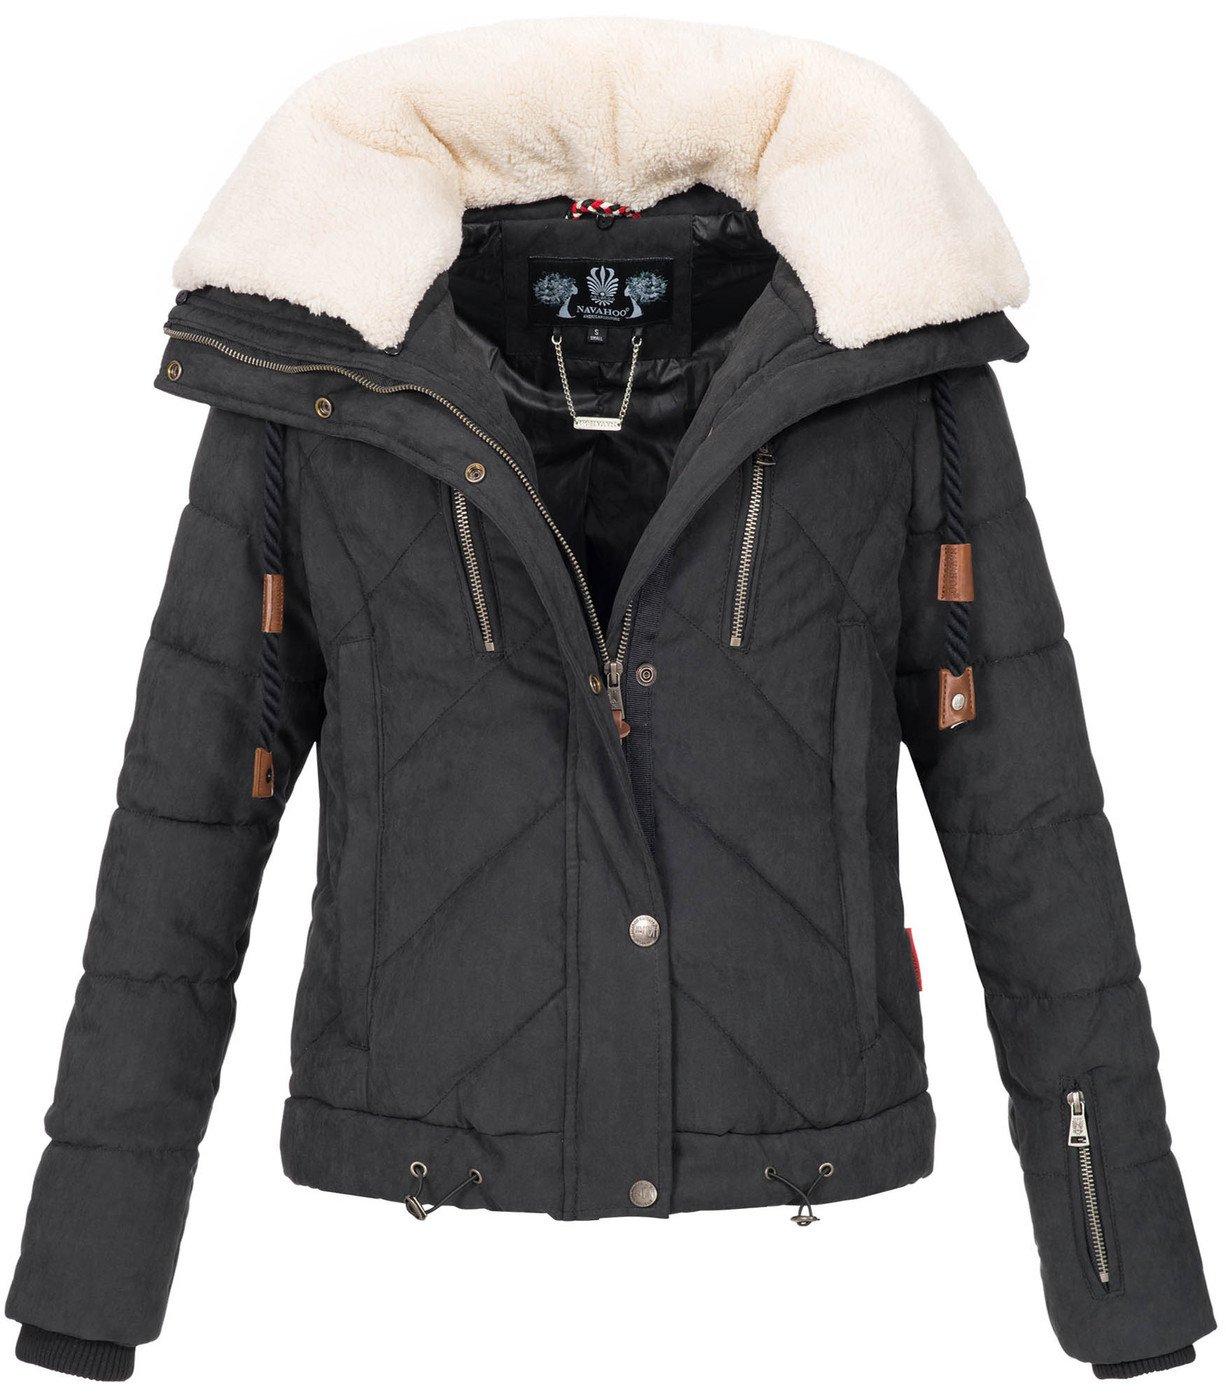 Navahoo Damen Designer Winter Jacke warme Winterjacke Steppjacke Teddyfell B605